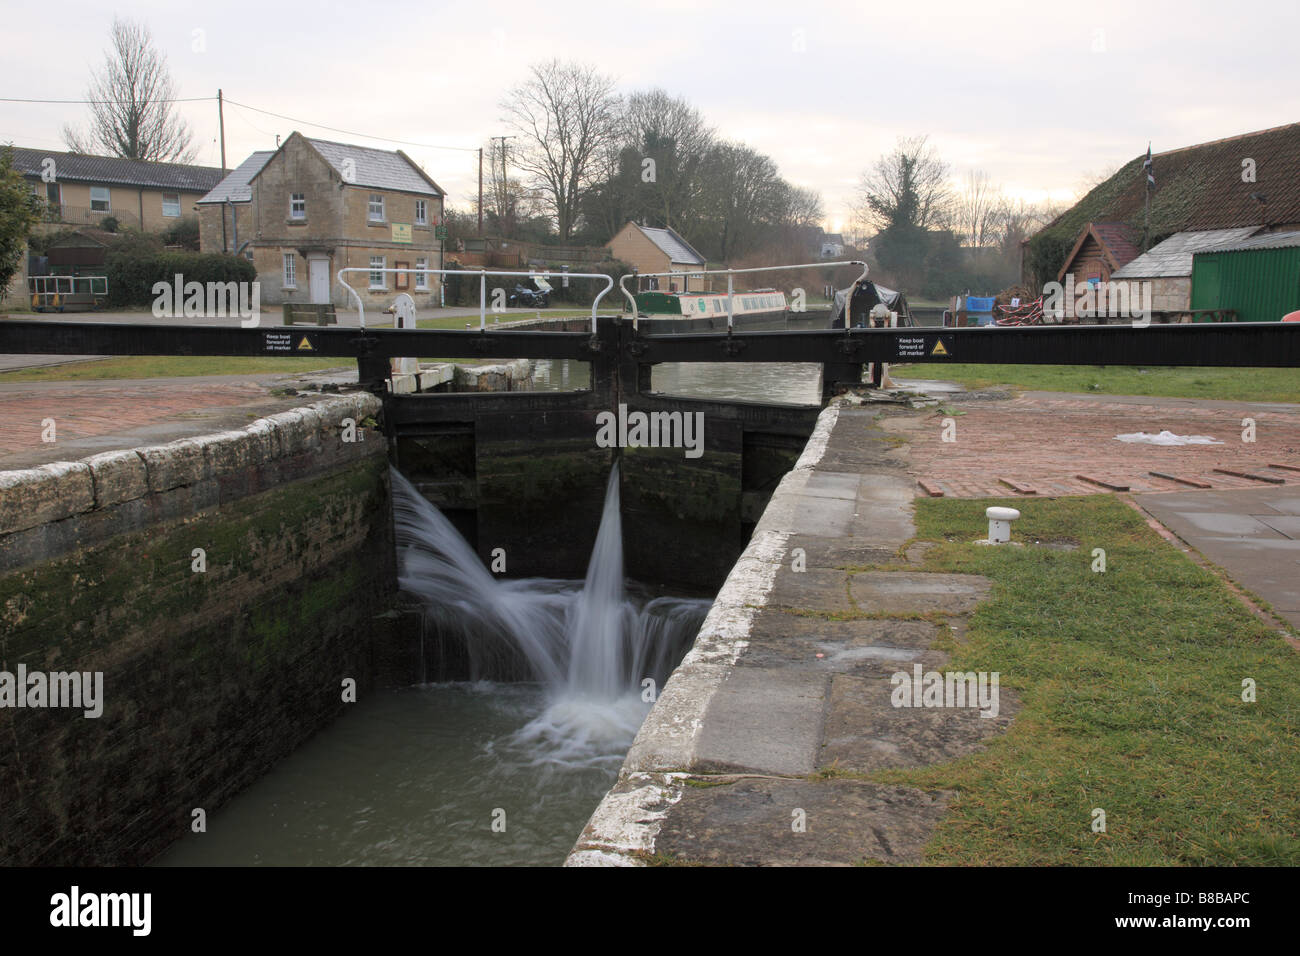 The Kennet & Avon Canal lock gates at Bradford on Avon - Stock Image